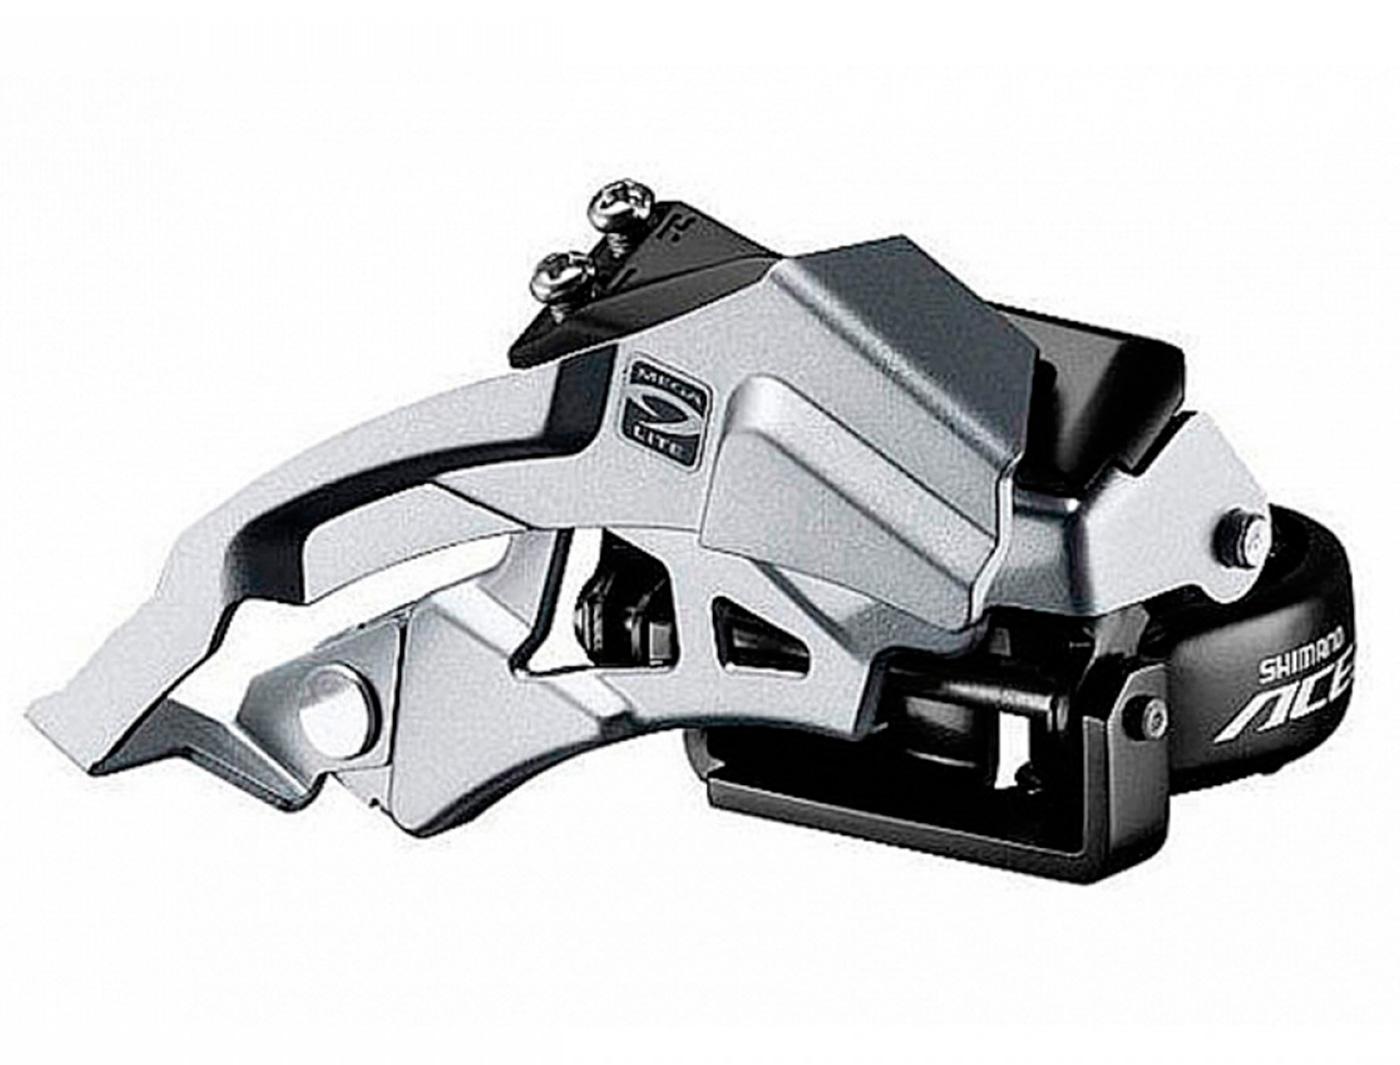 Перек-ль передний Shimano Acera M3000, ун. тяга, ун. хомут, для рамы с угол 63-66, для 40T